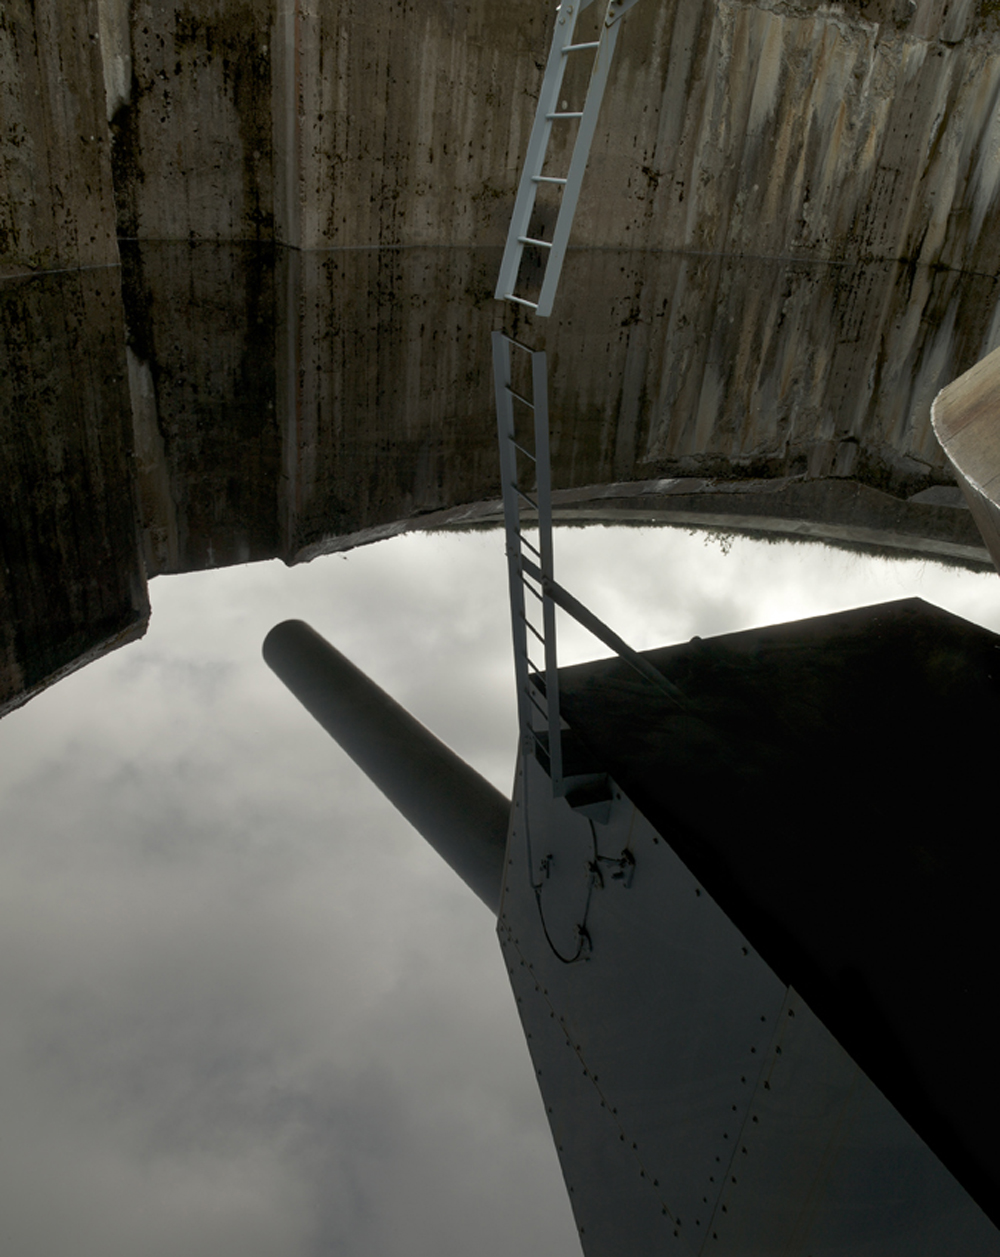 Adolf Gun, Harstad 8, 2009, fotografia a colori, cm 200x160